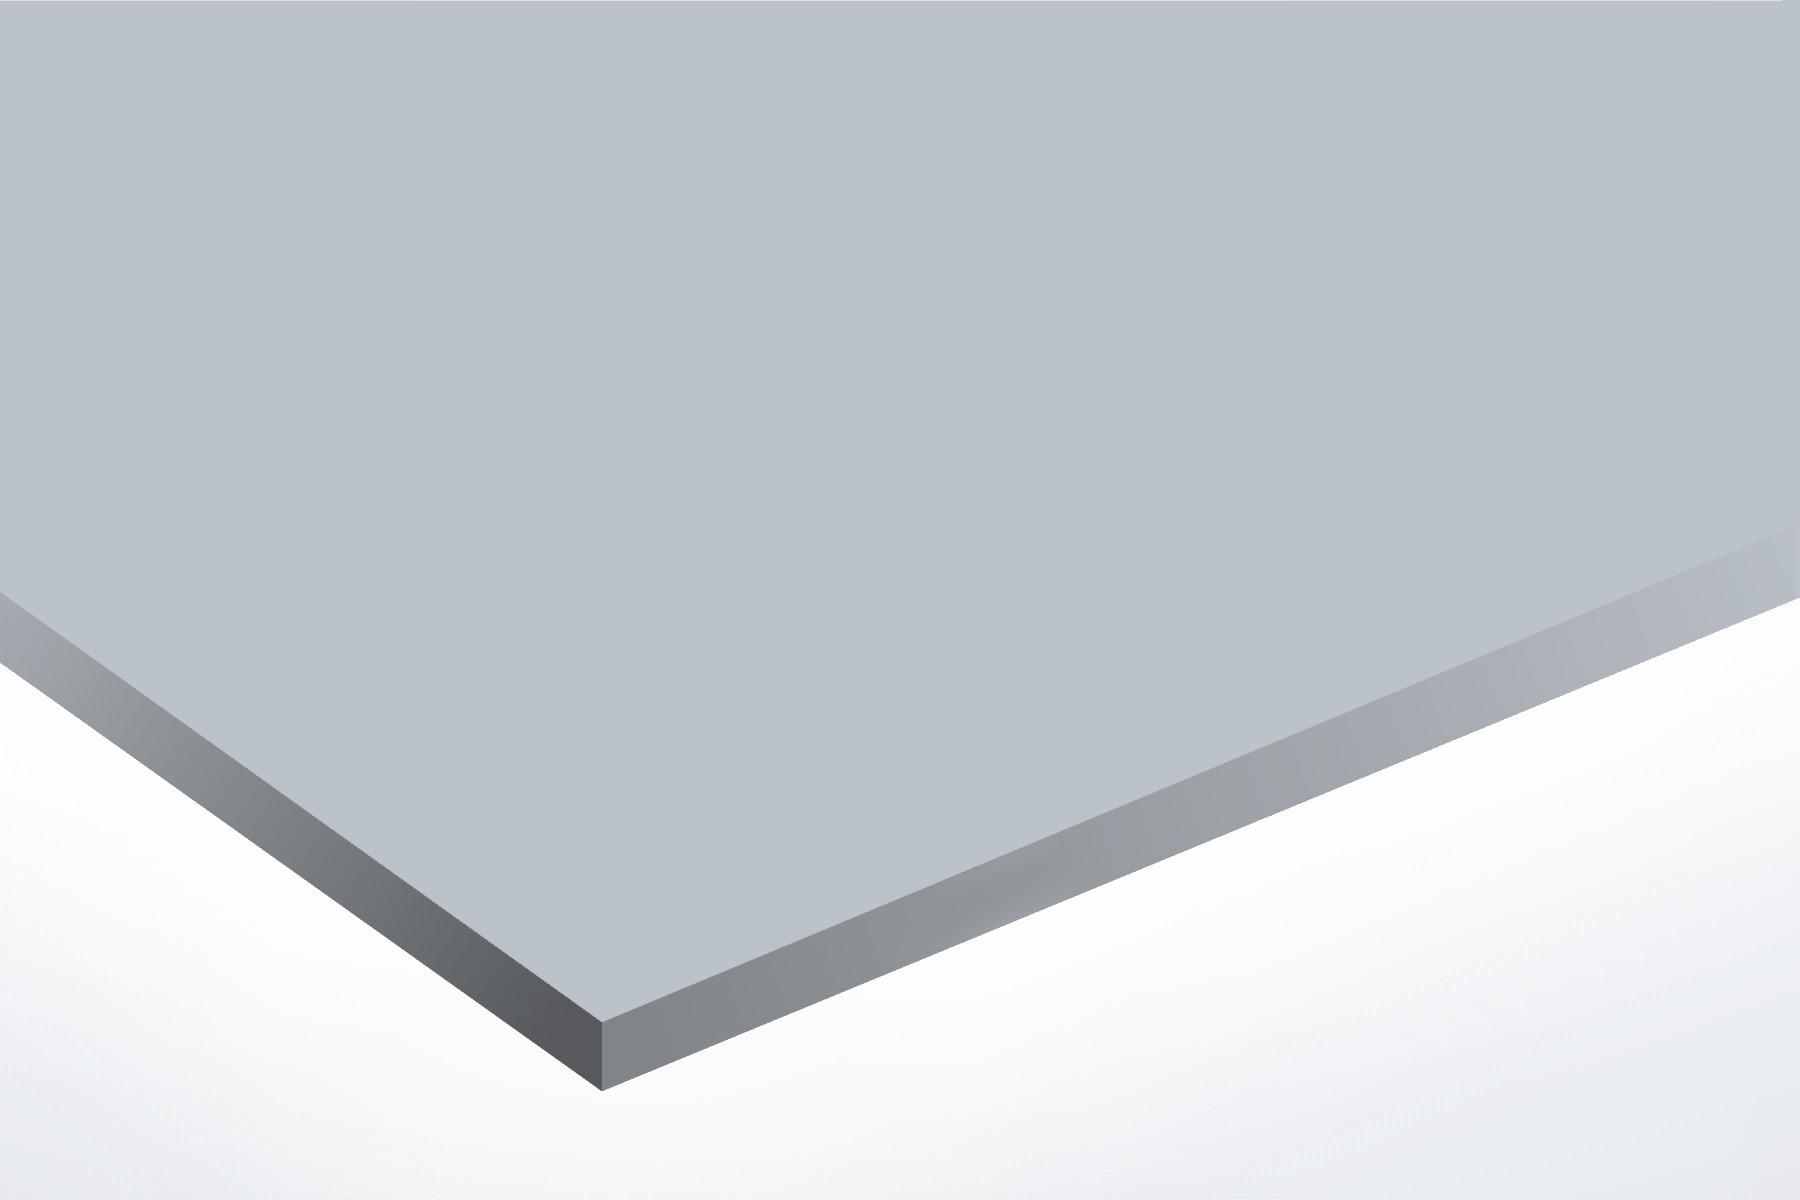 Anodised Aluminium Natural, Matt, 0.5mm x 1000mm x 500mm